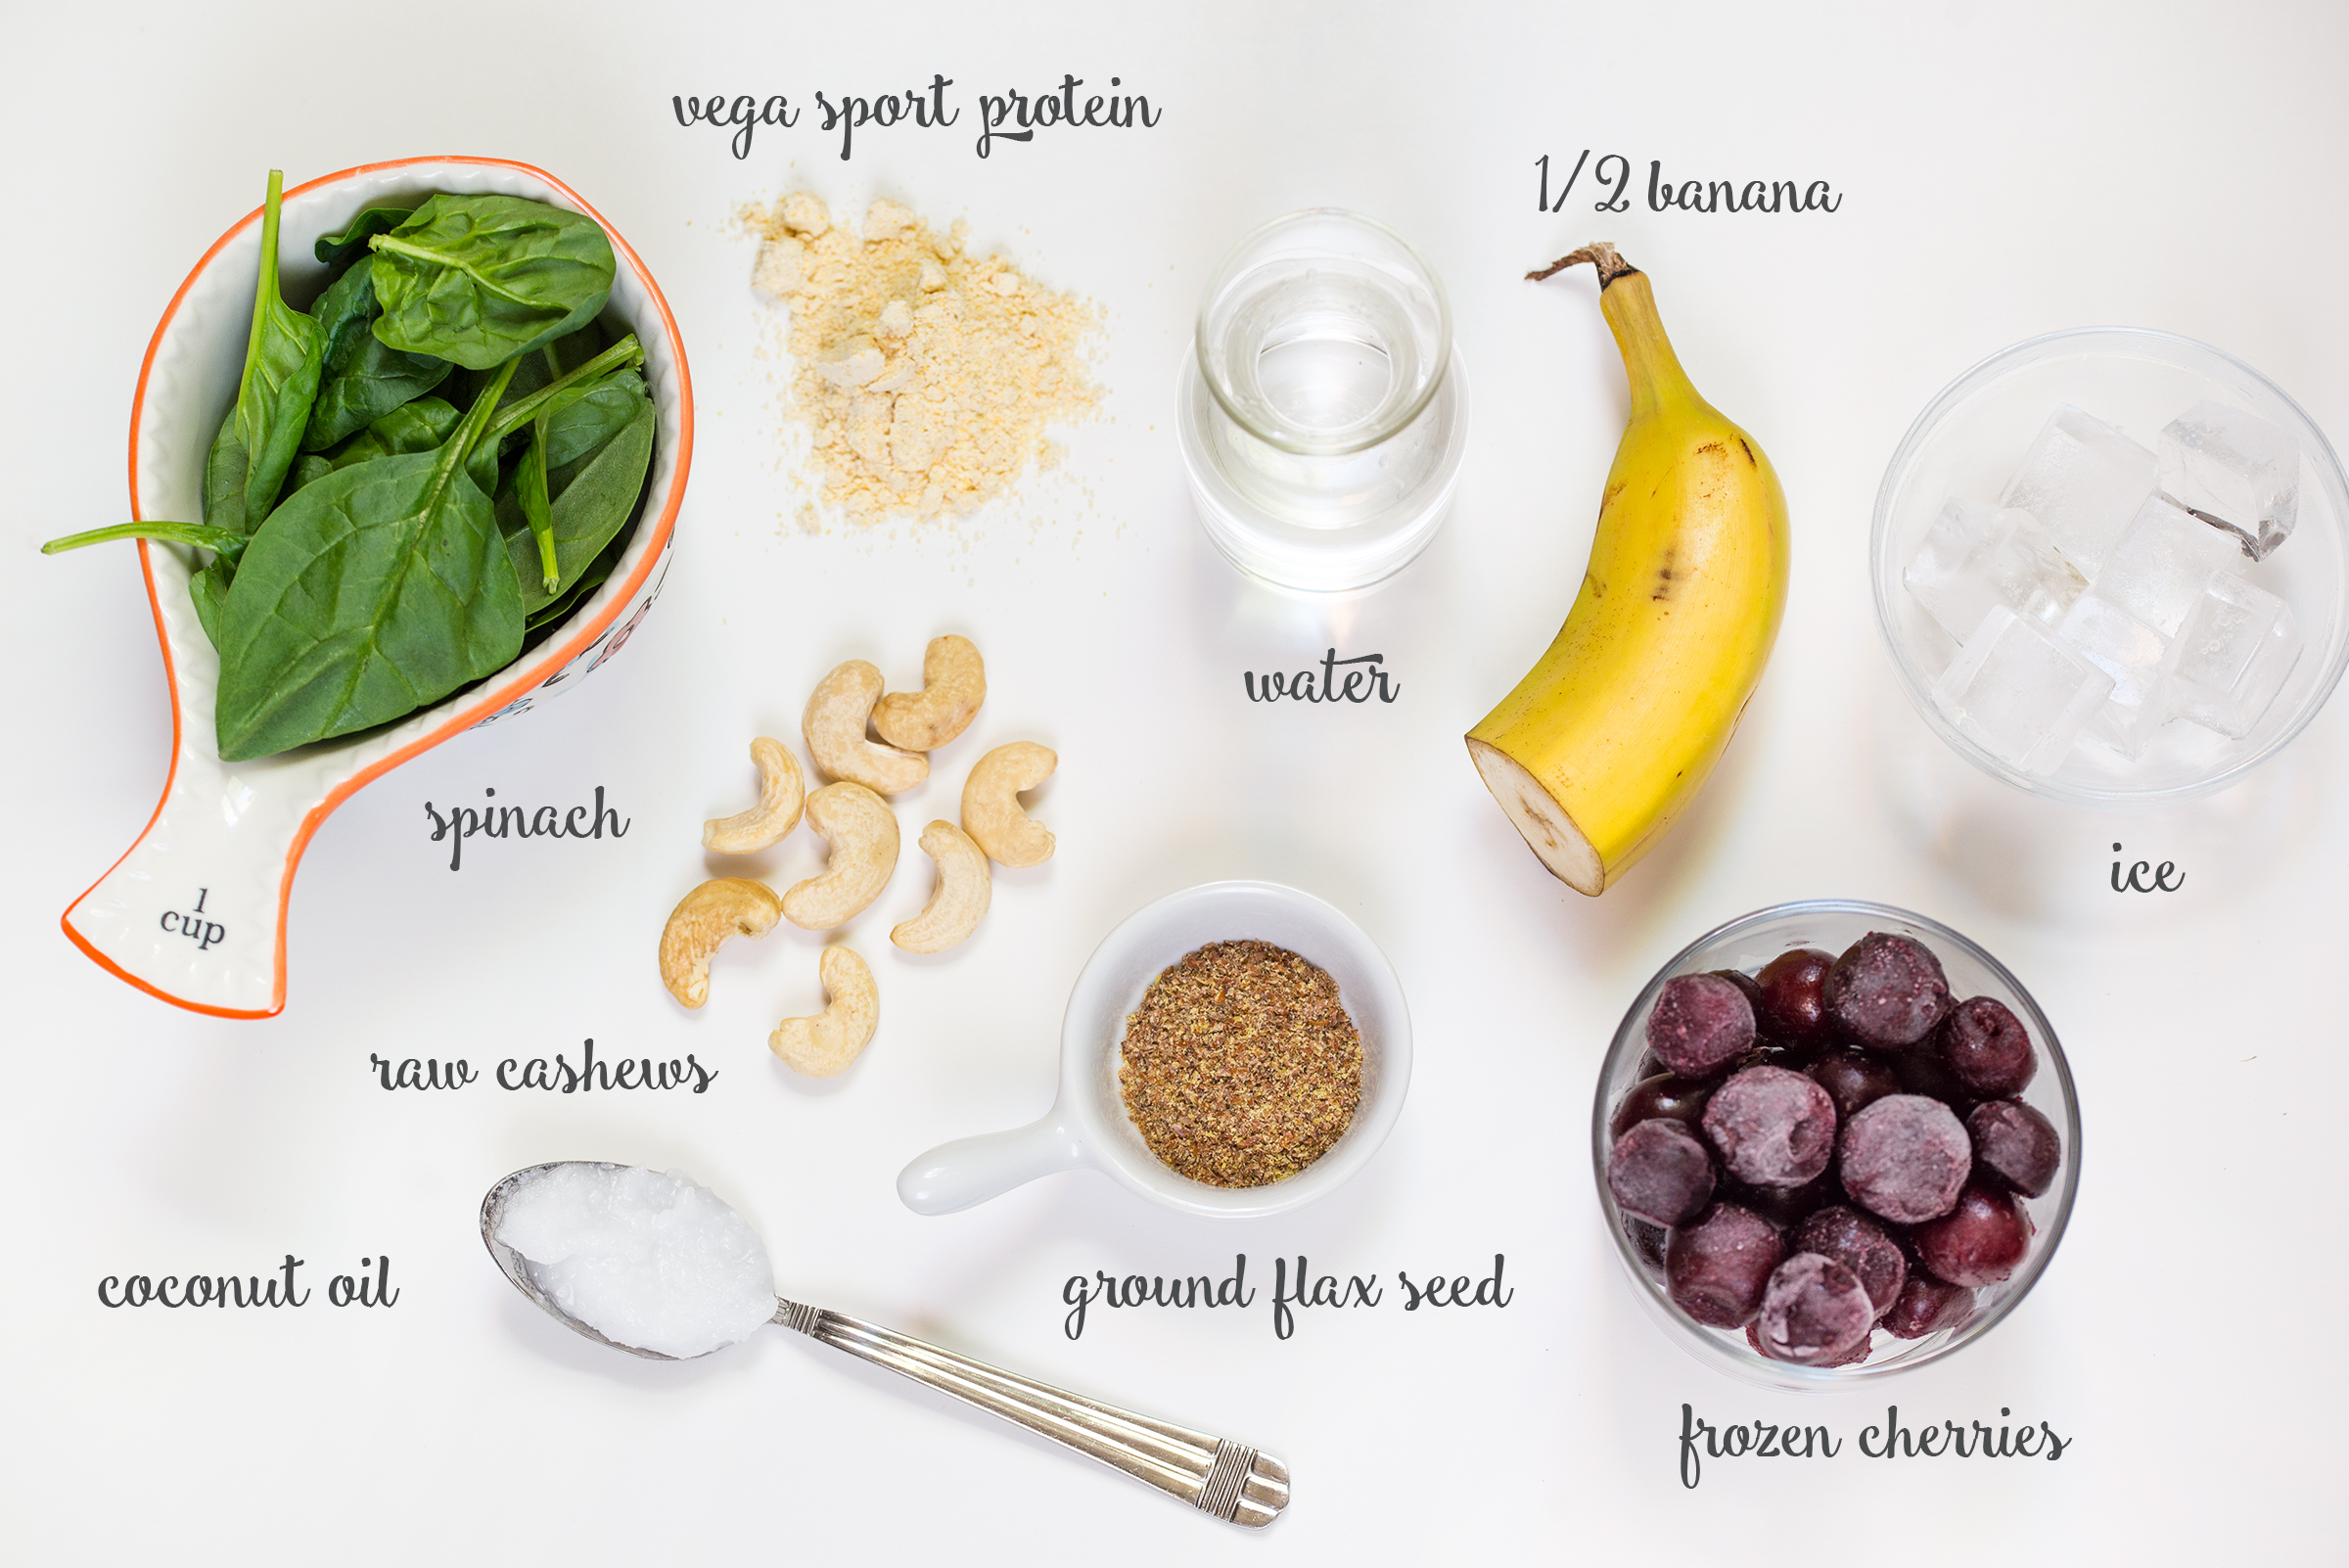 cherry-smoothie-ingredients-typo.jpg